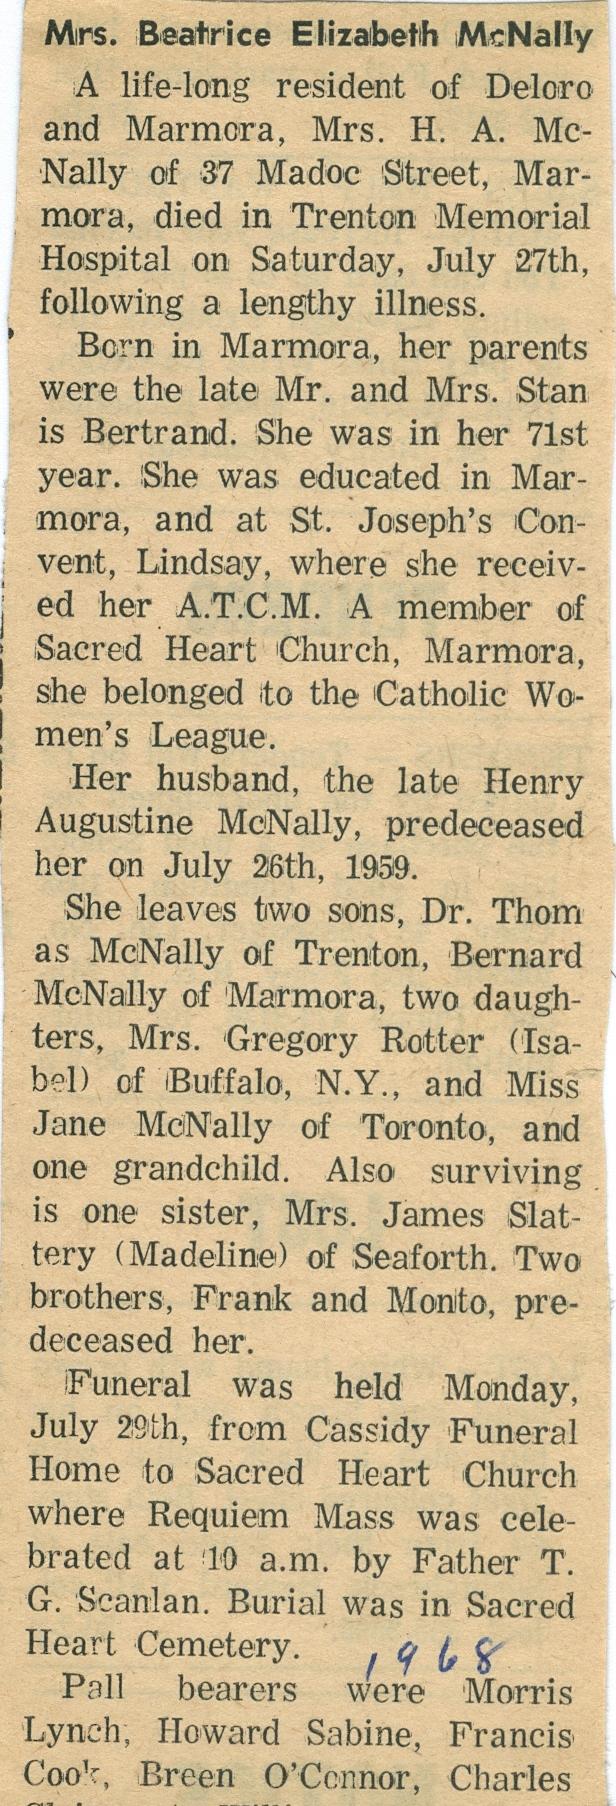 McNally, Beatrice Eliz. (Bertrand)  1897-1968.jpg